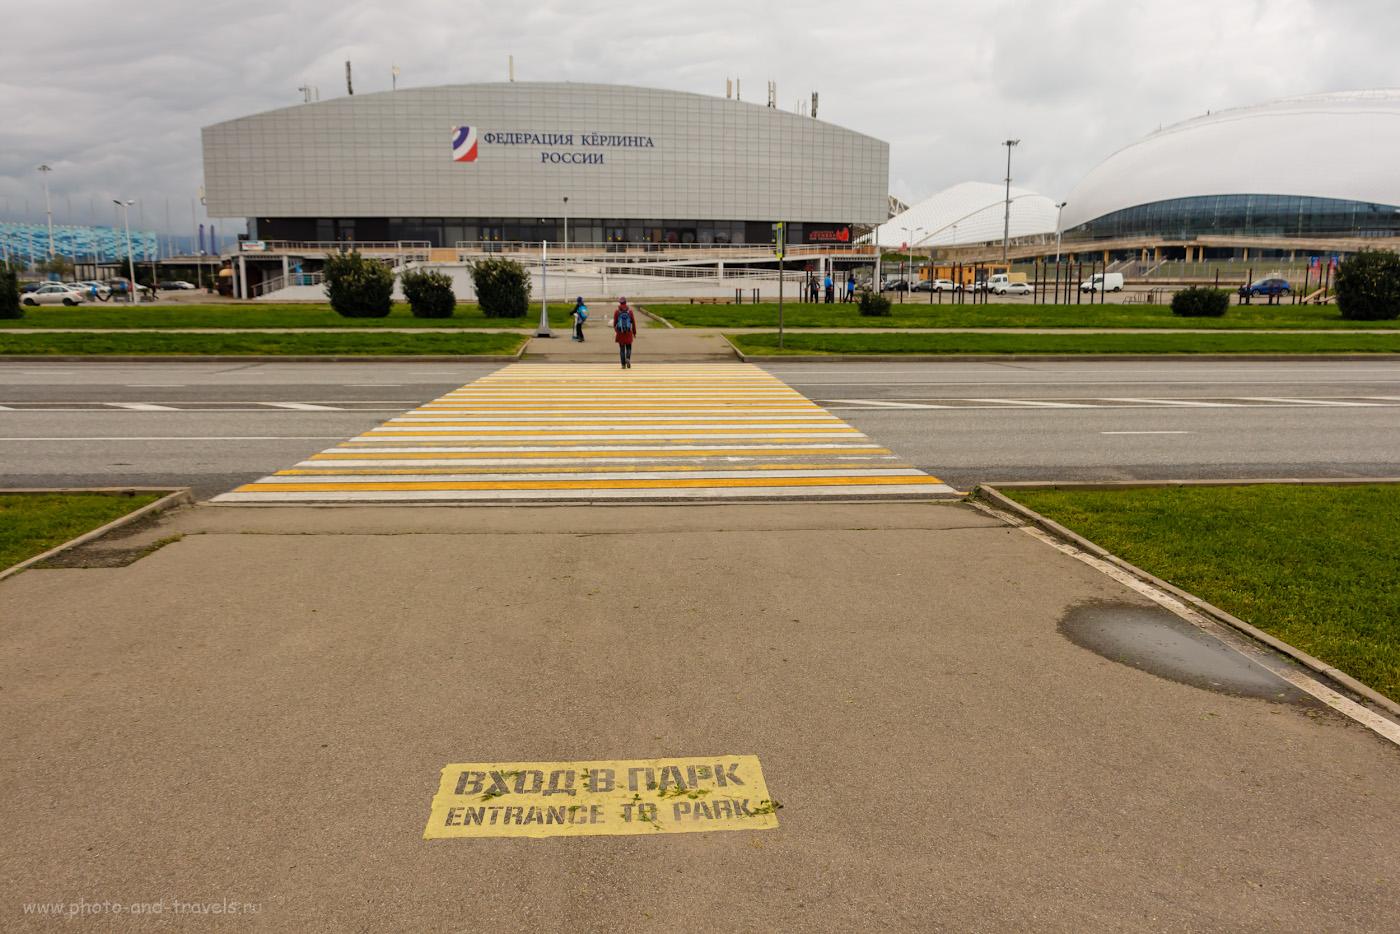 Фото 36. Вход в Олимпийский парк со стороны кёрлингового центра «Ледяной куб». 1/1250, f/4, ISO 200, 18мм.